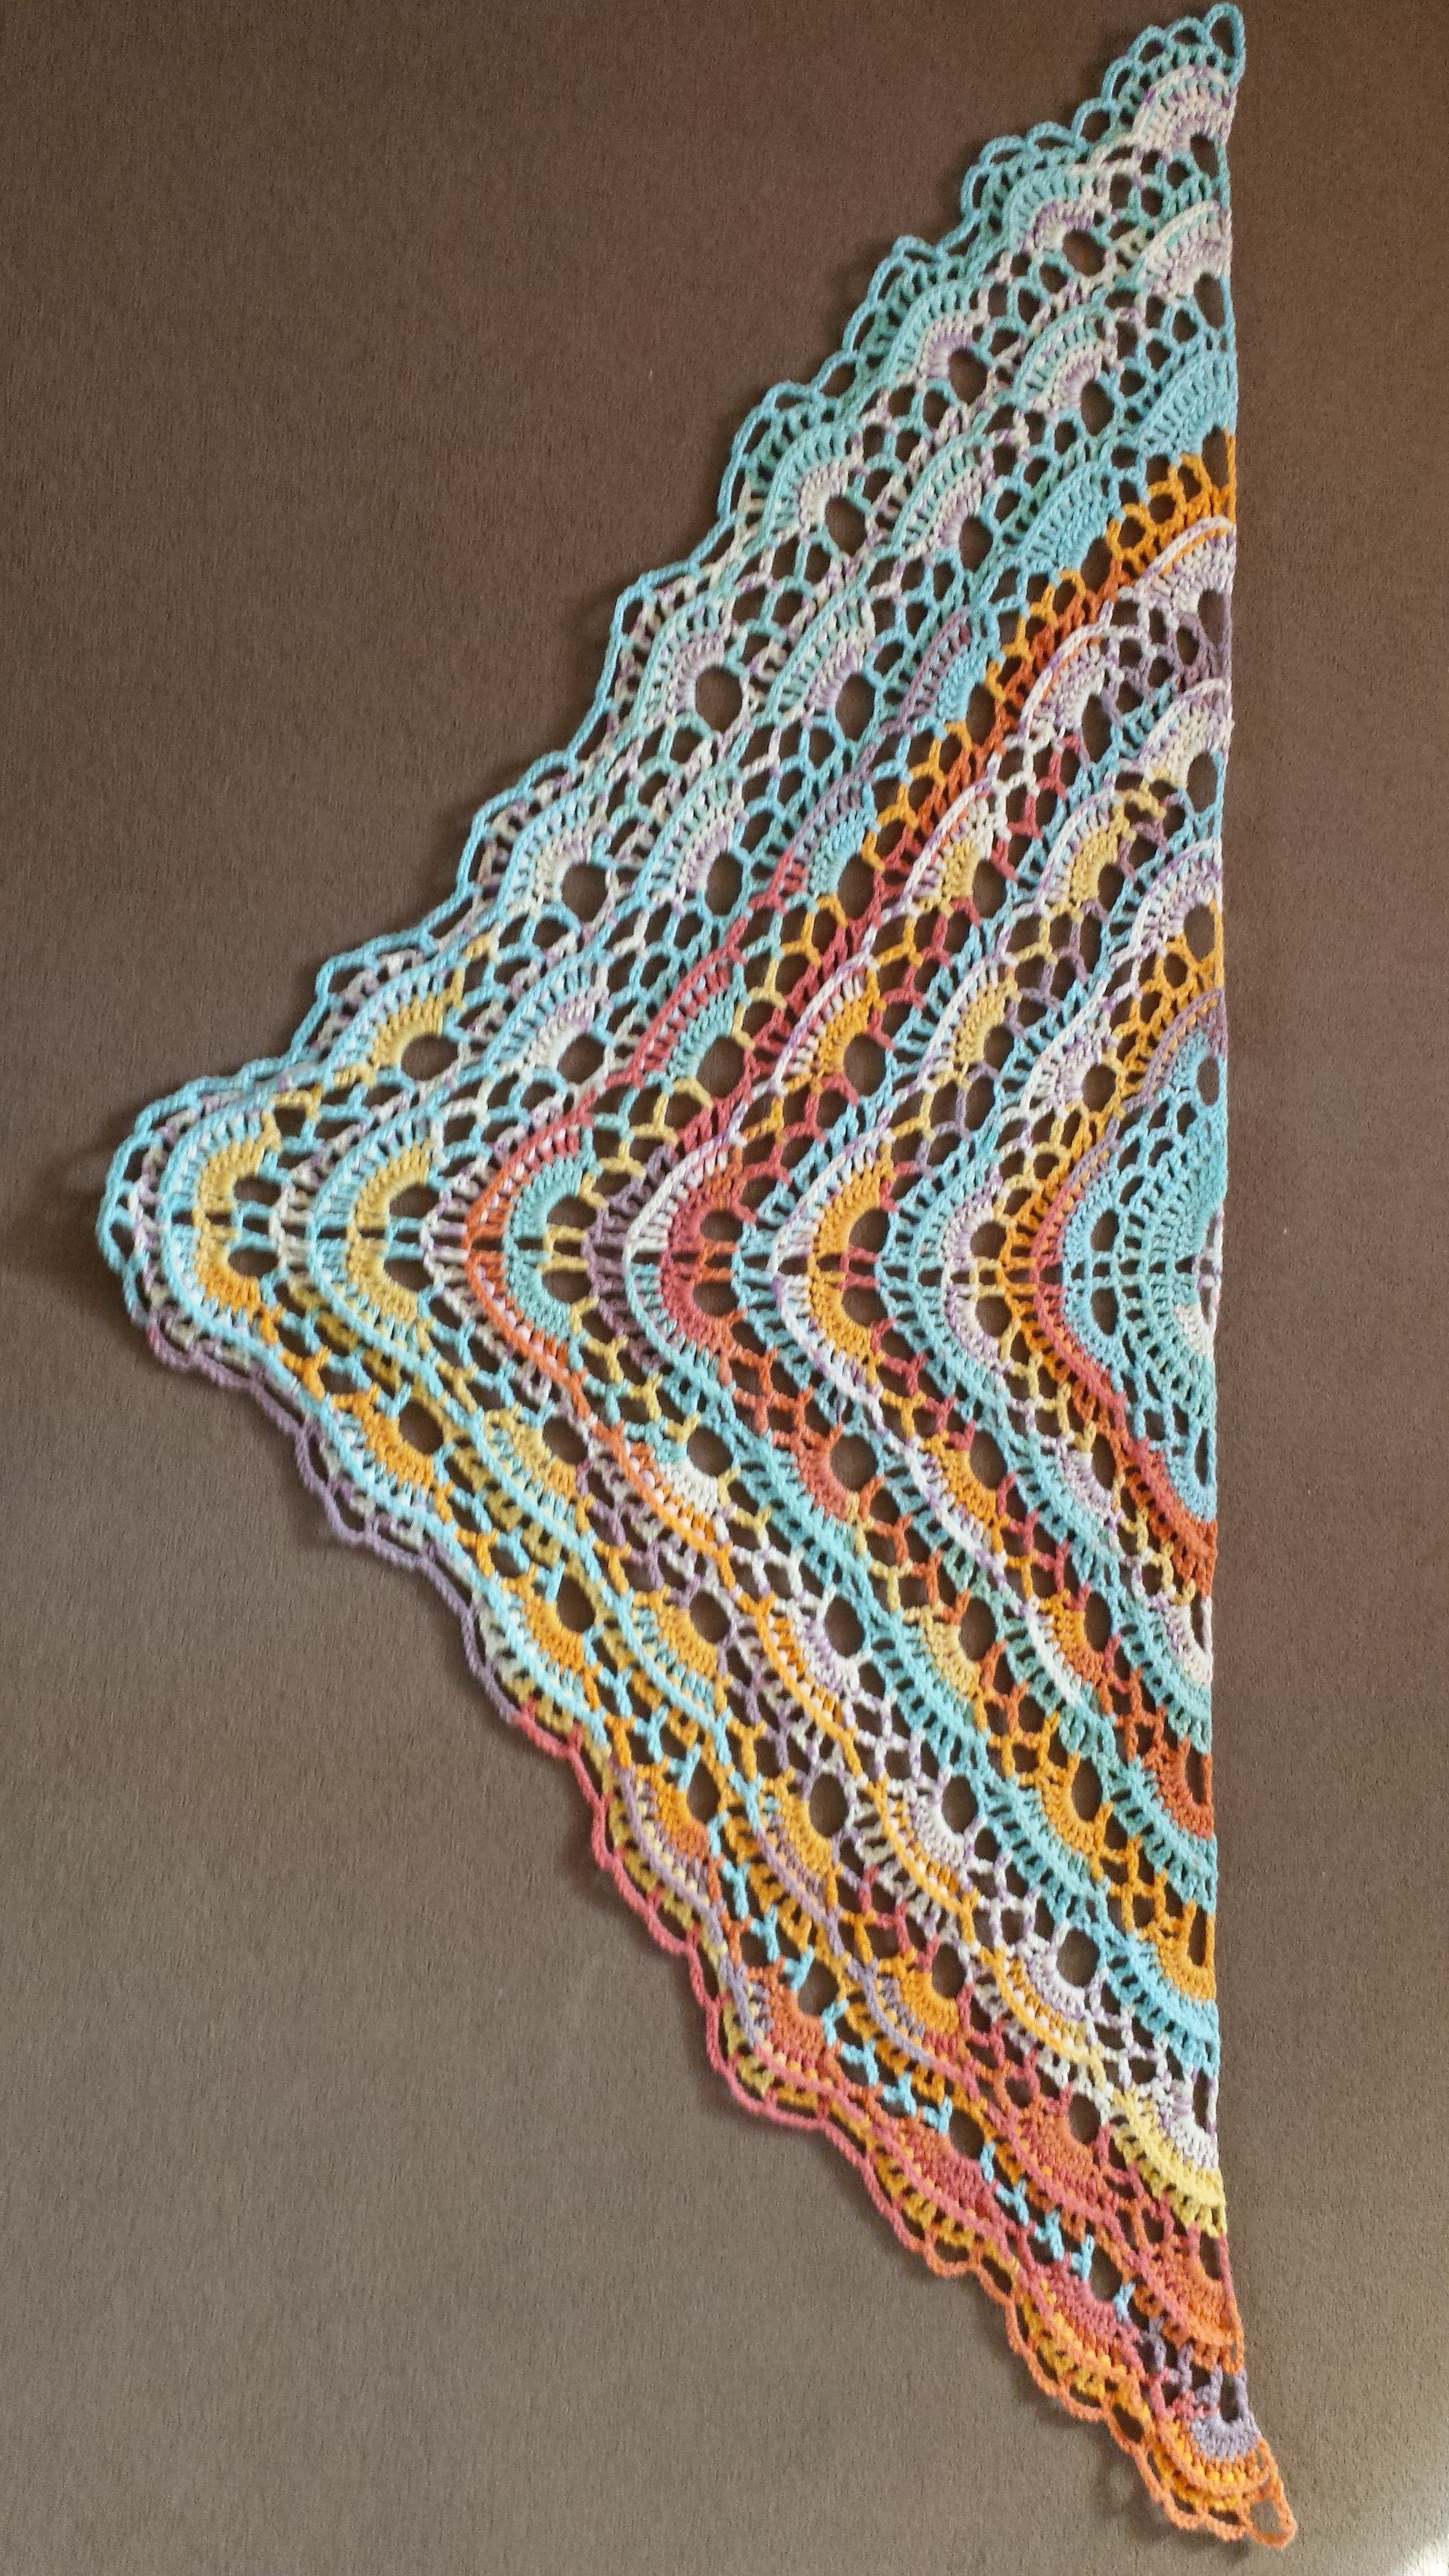 Bernat yes yes shawl free intermediate womens shawl crochet bernat yes yes shawl free intermediate womens shawl crochet pattern wrap up your warm bankloansurffo Choice Image